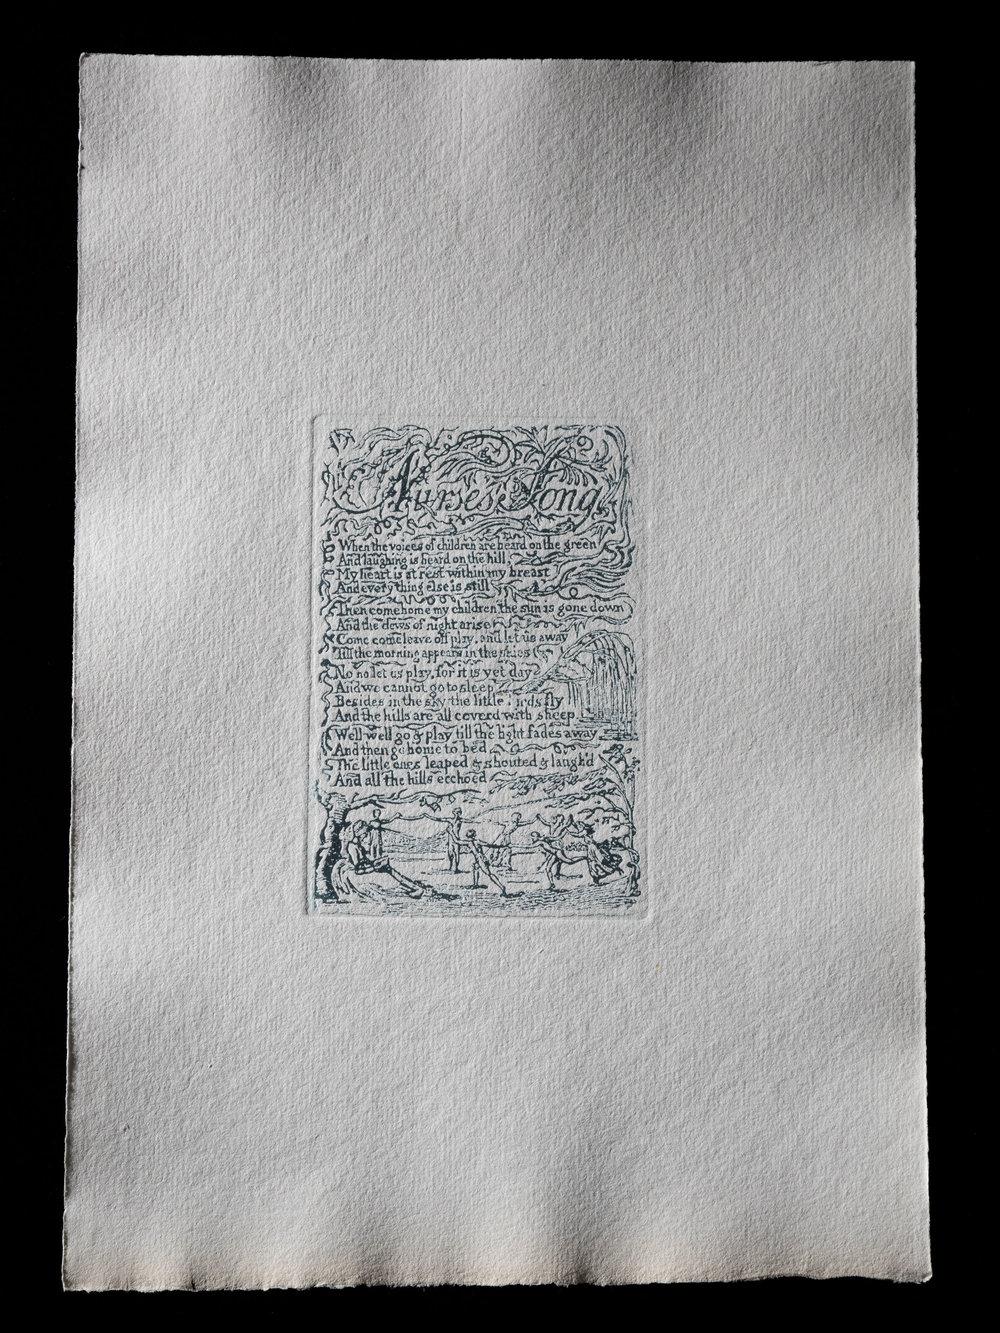 11. Nurses Song, 118 x 79 mm